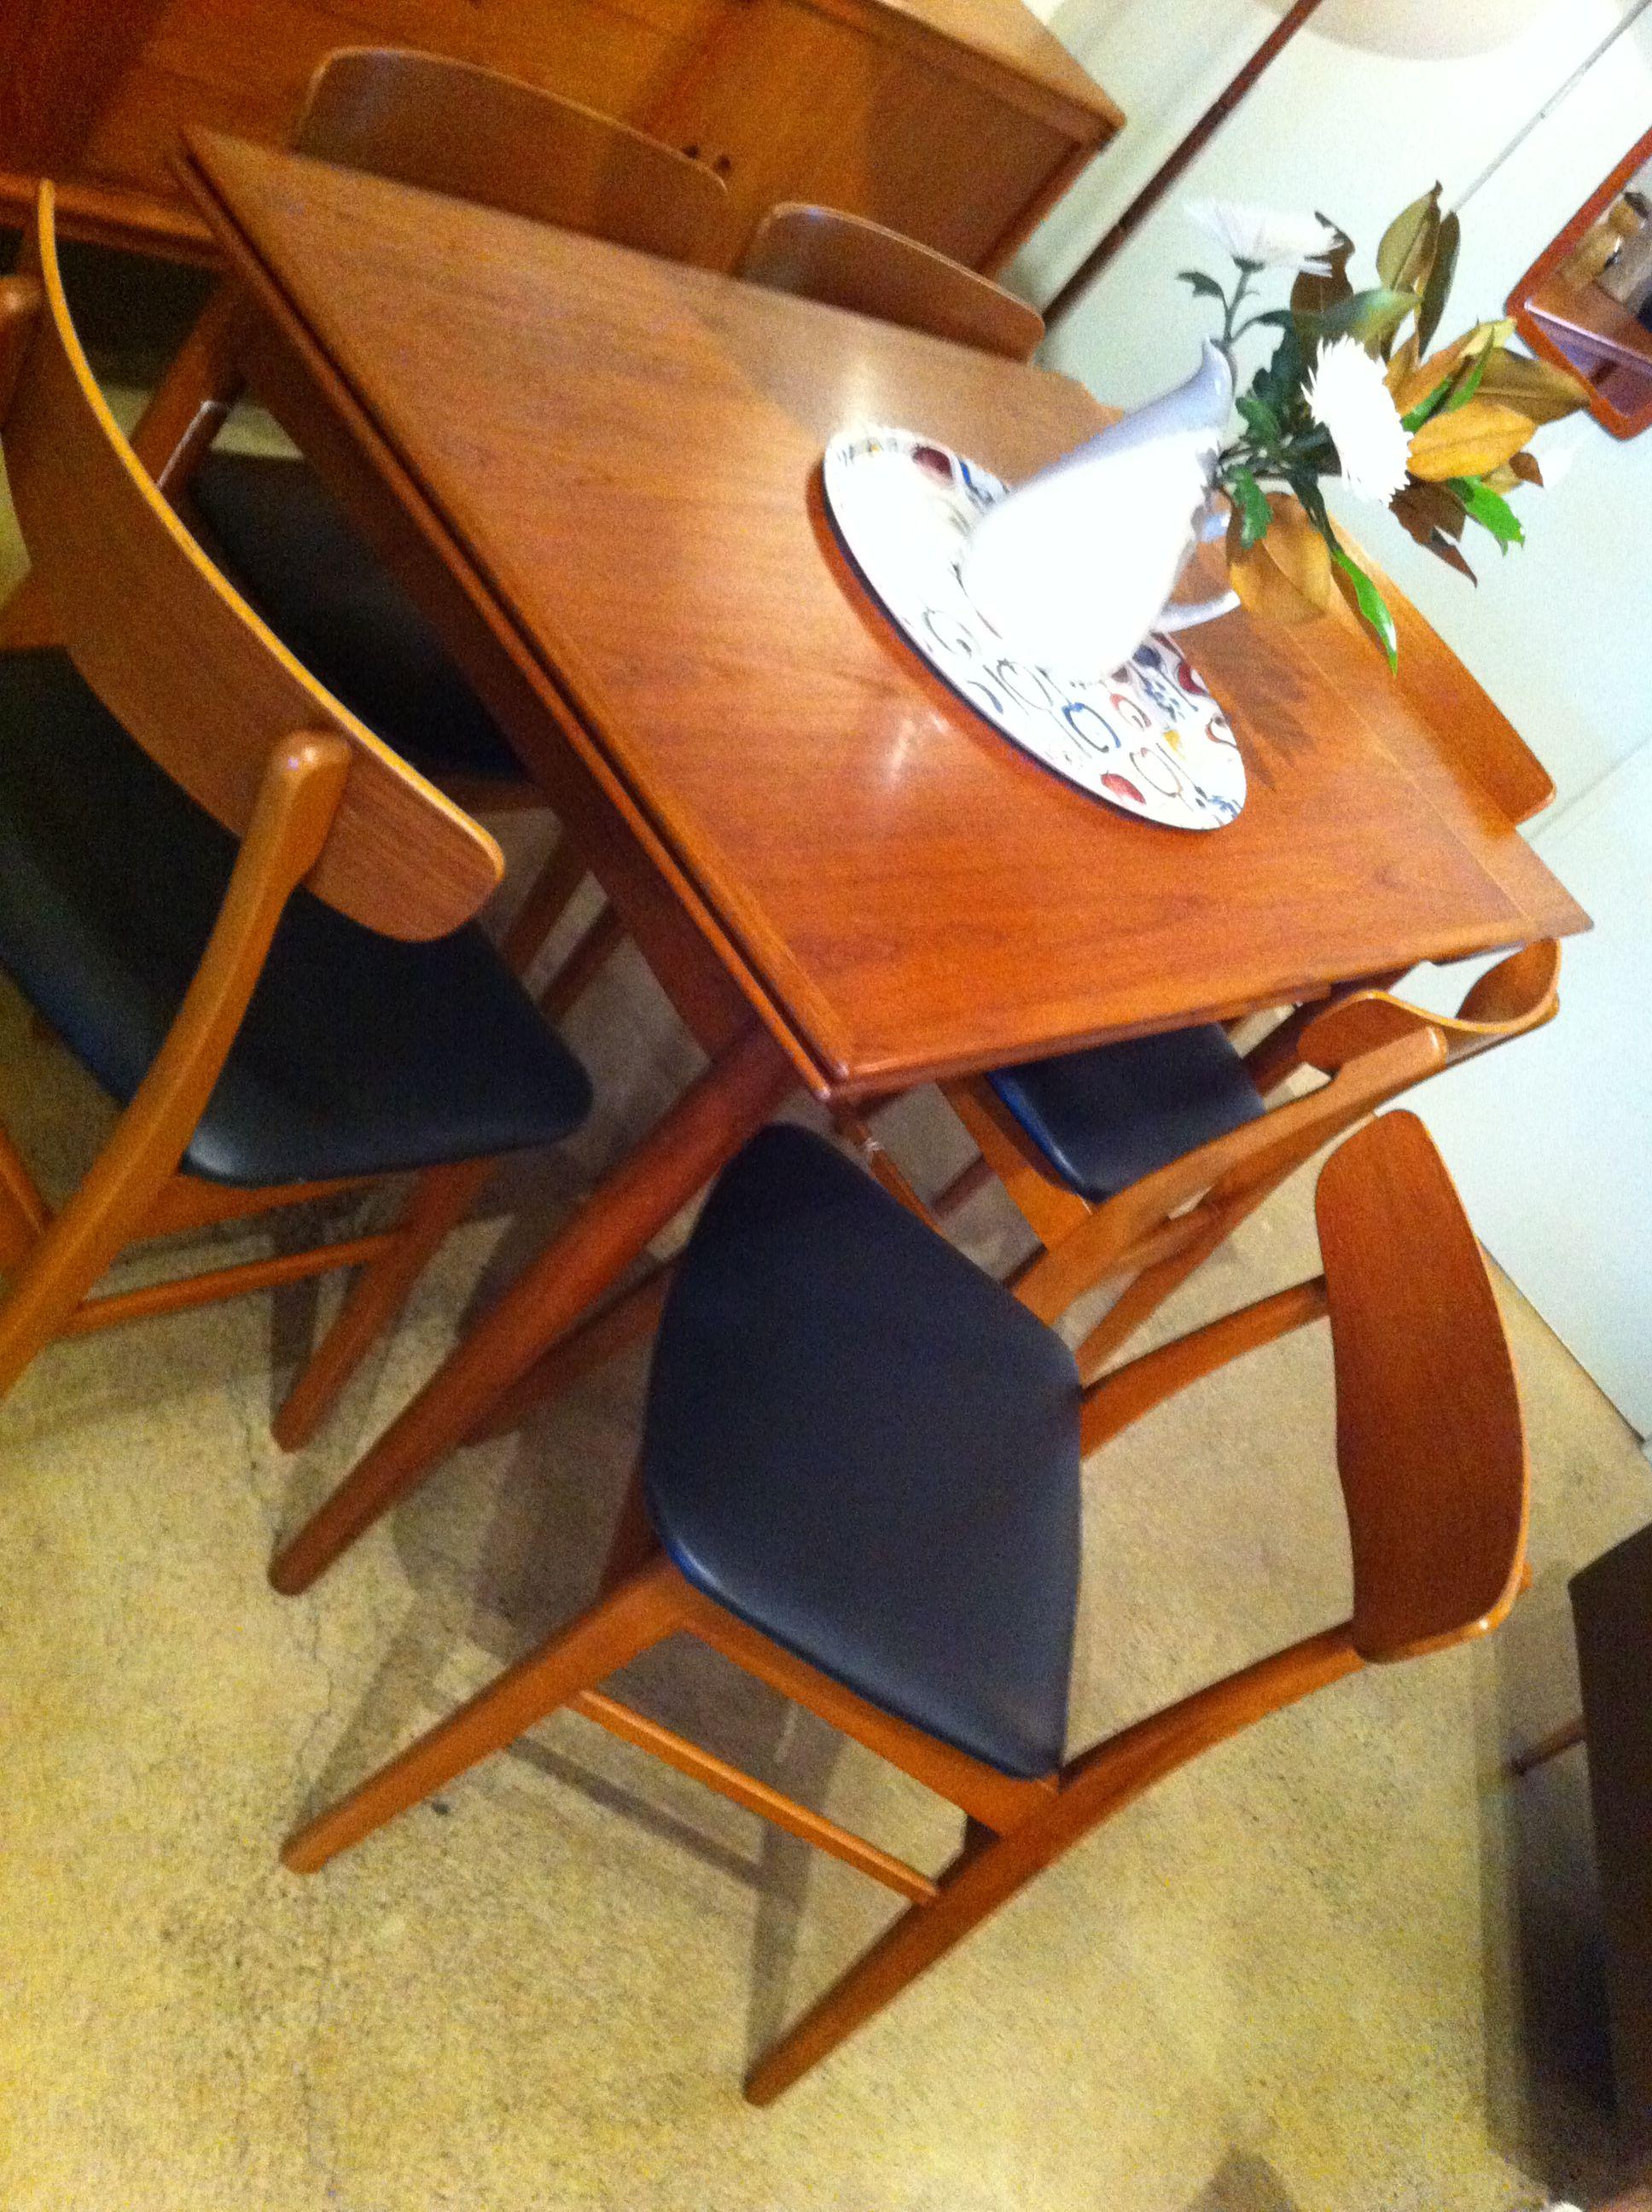 Teak Dining Table Farstrup Chairs Teak Table Teak Dining Table Teak Furniture